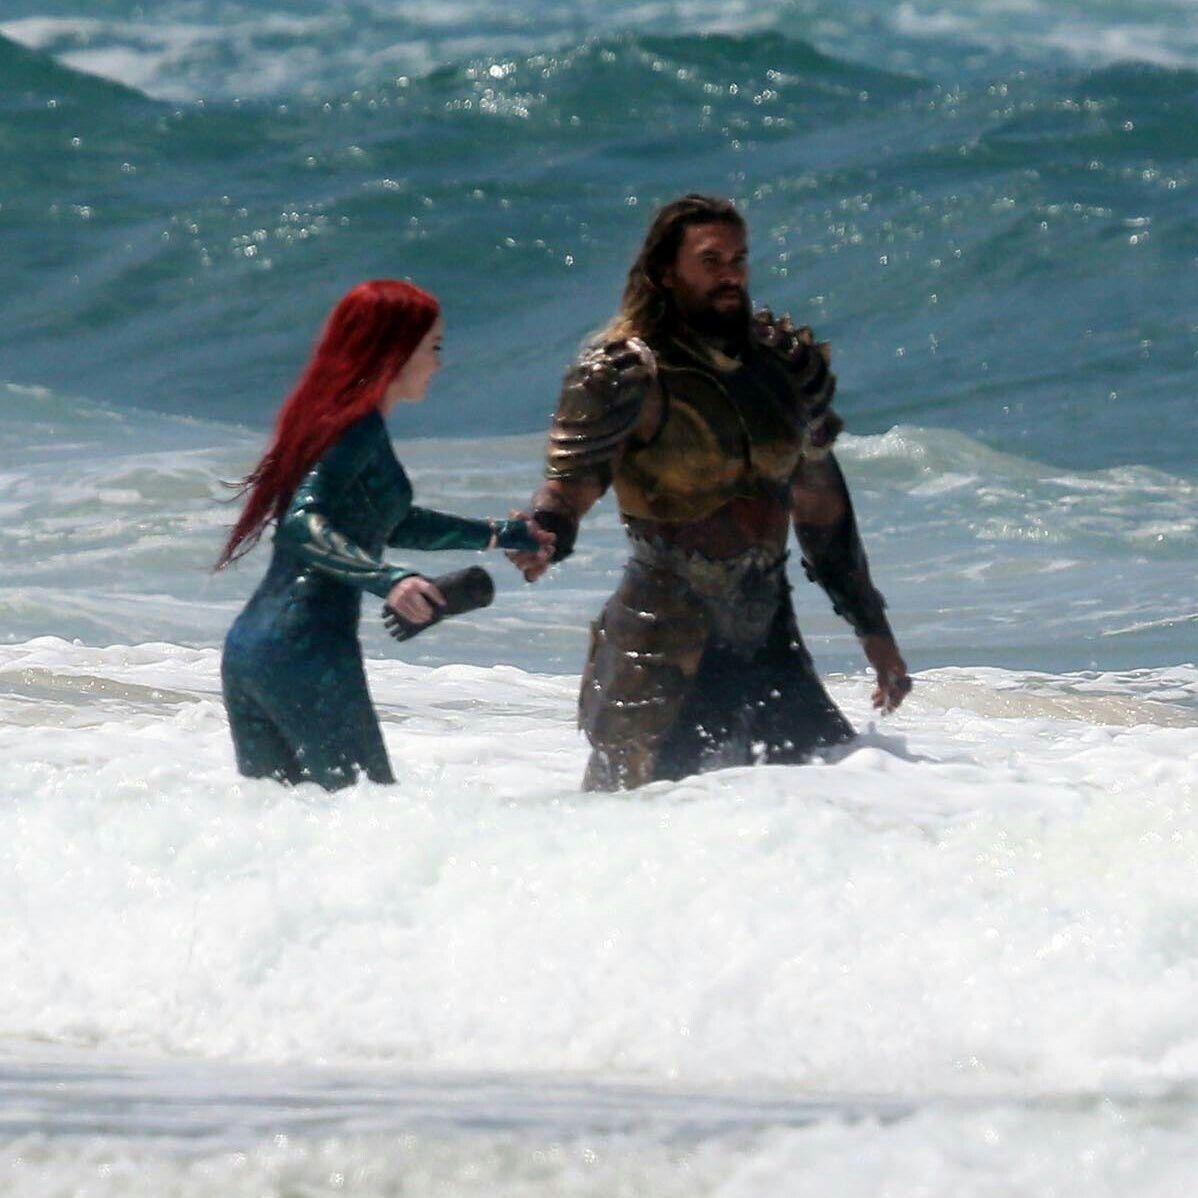 New Jason Momoa And Amber Heard Aquaman Image: Amber Heard And Jason Momoa As Mera & Aquaman Filming